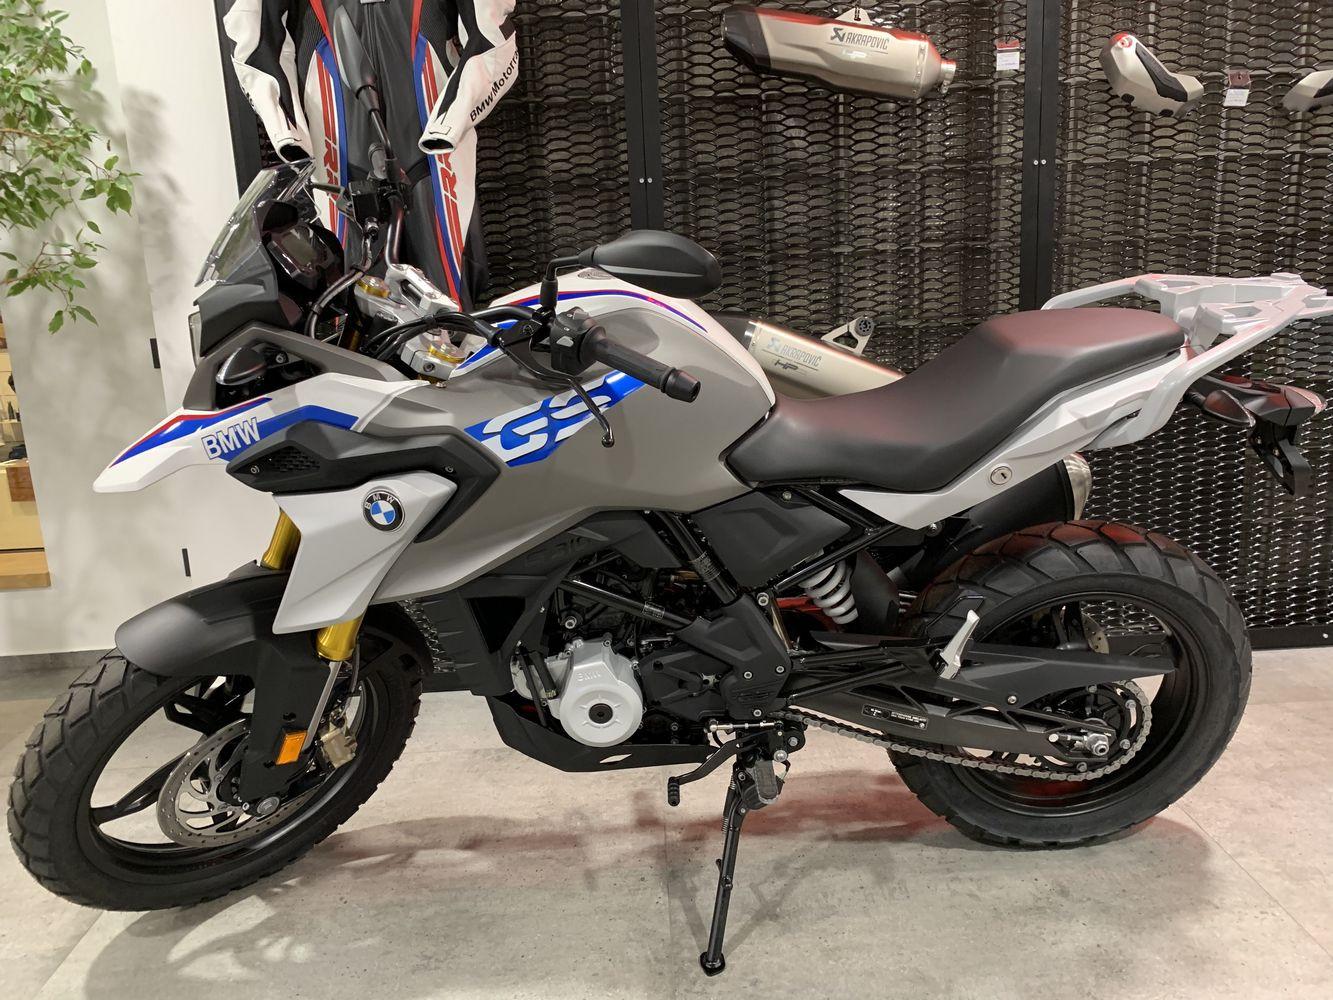 G 310 GS MOTORSPORT